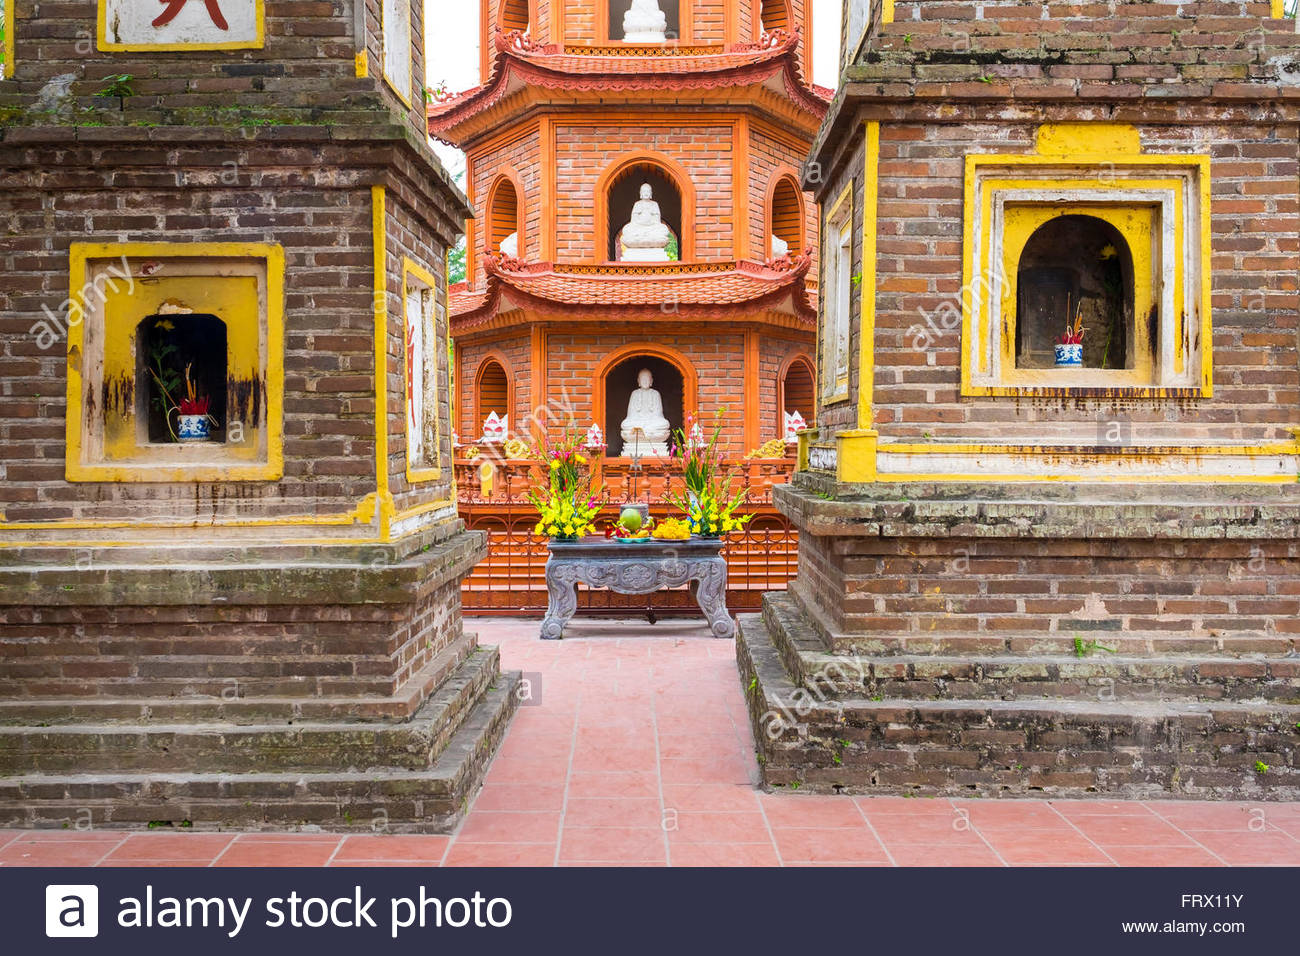 Tran Quoc Pagoda (Chua Tran Quoc), Tay Ho District, Hanoi, Vietnam Stock Photo